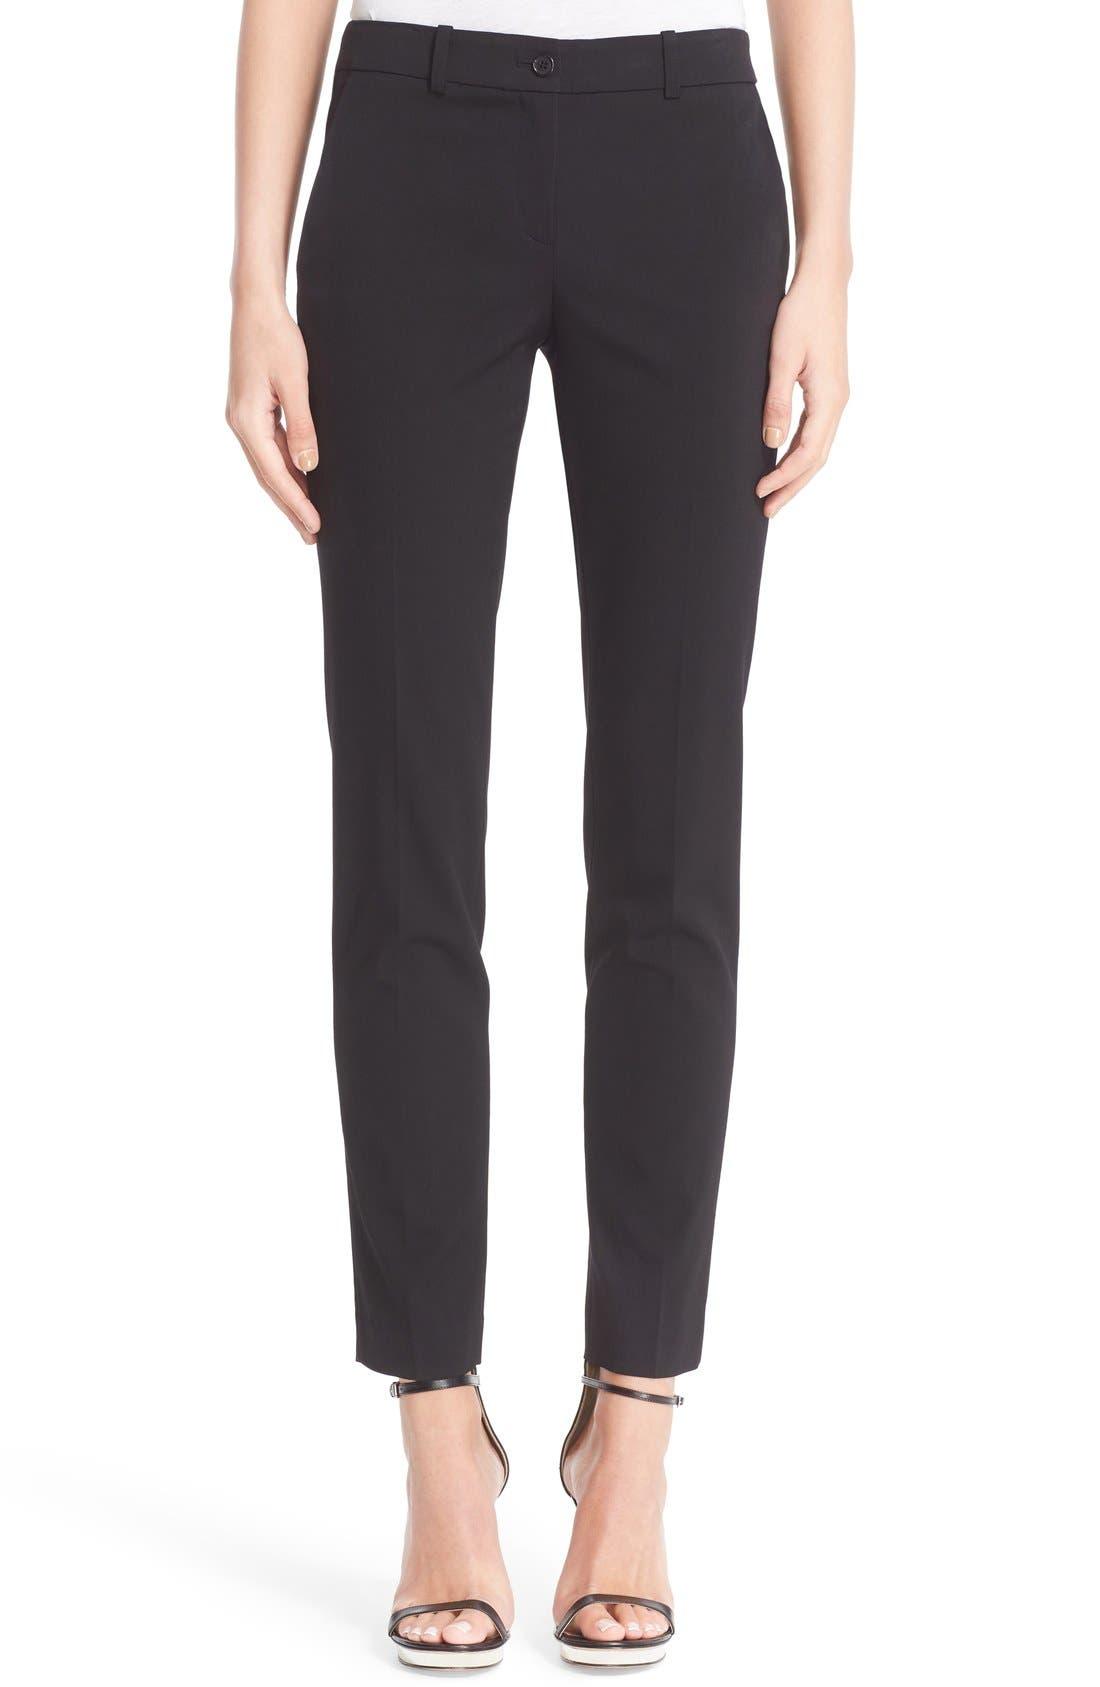 Alternate Image 1 Selected - Michael Kors Samantha Straight Leg Pants